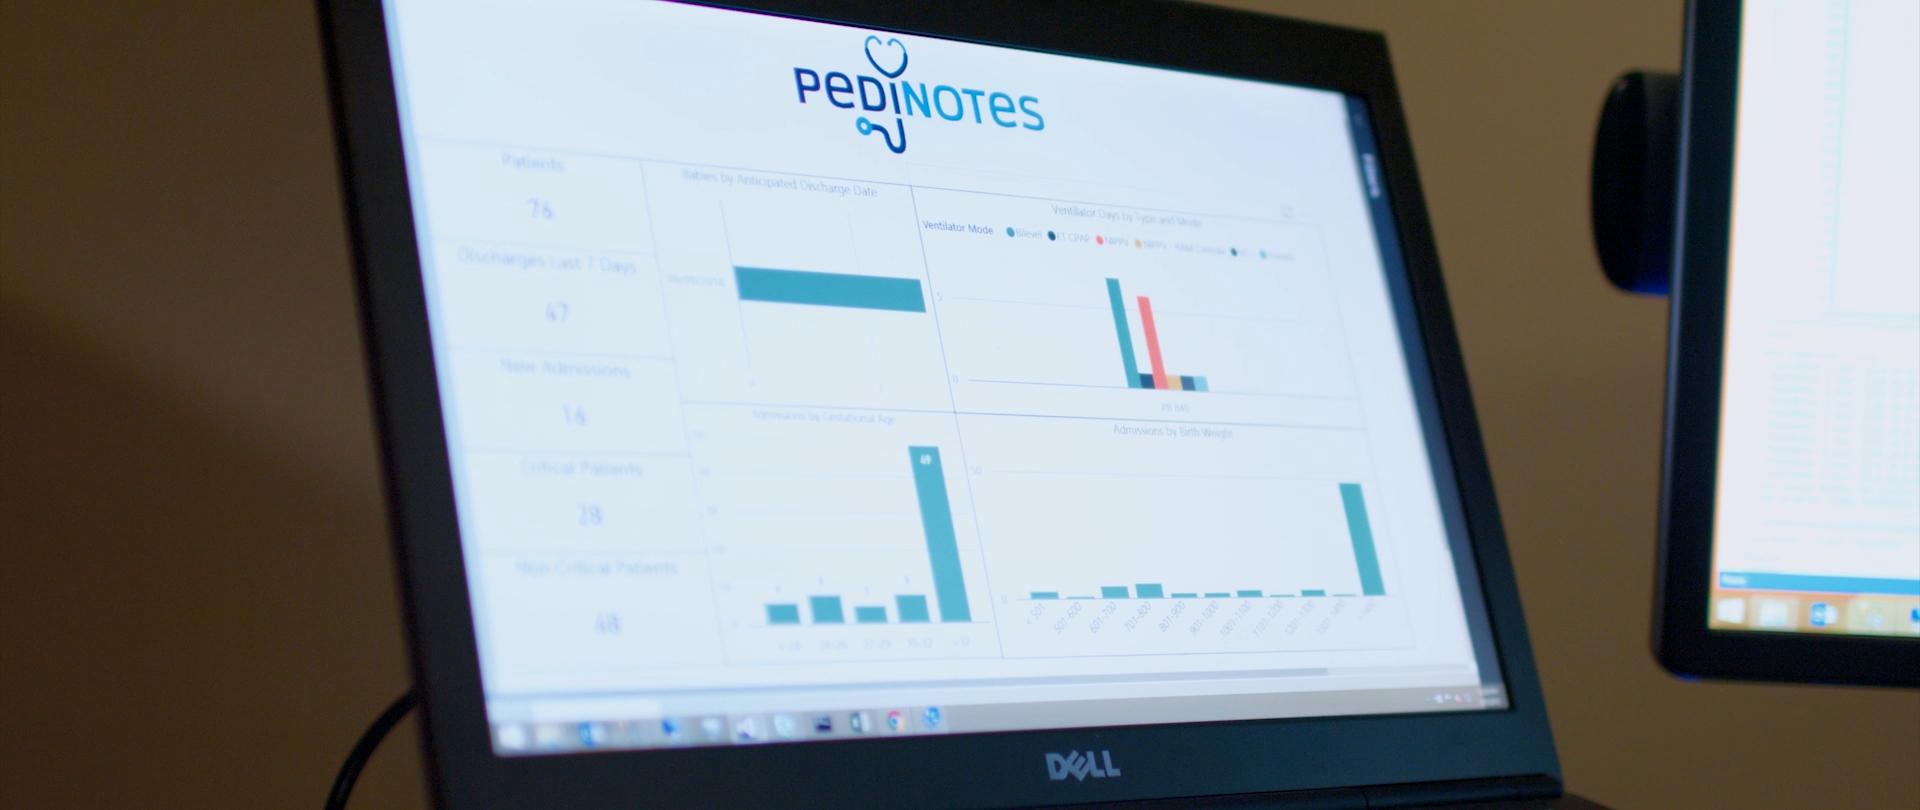 PediNotes Feature - Pedi Analytics.png